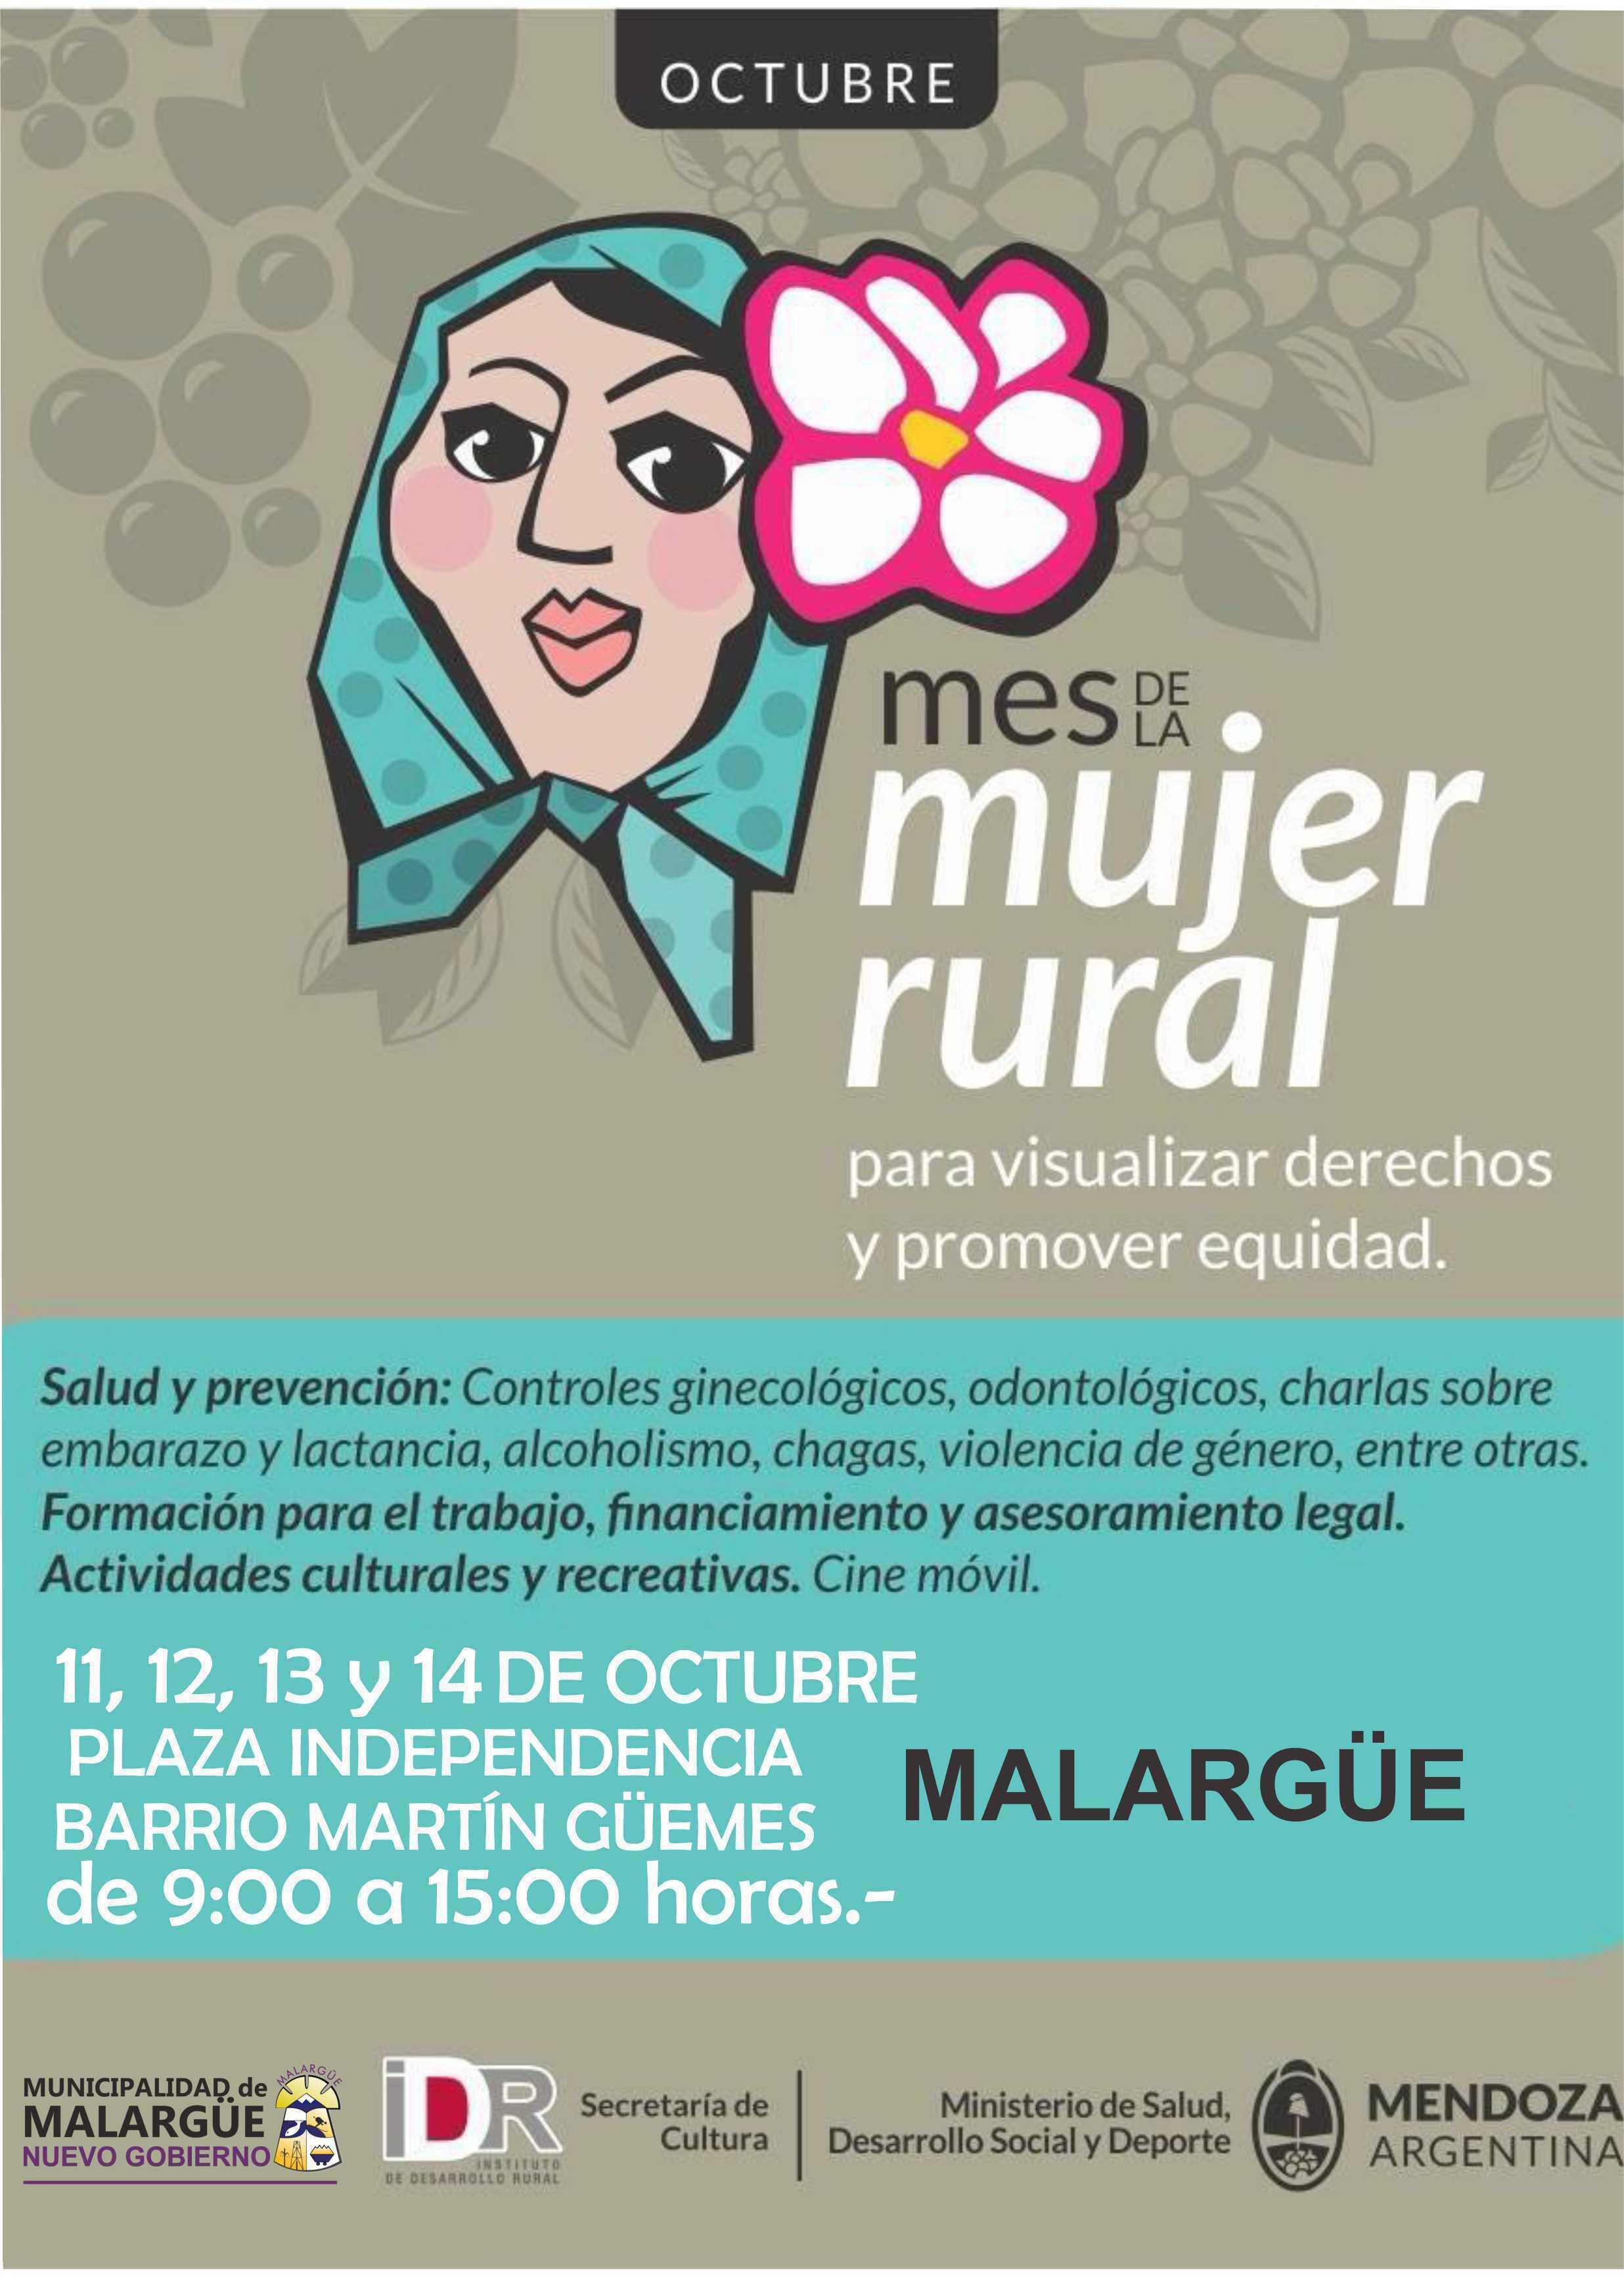 rural-mujer